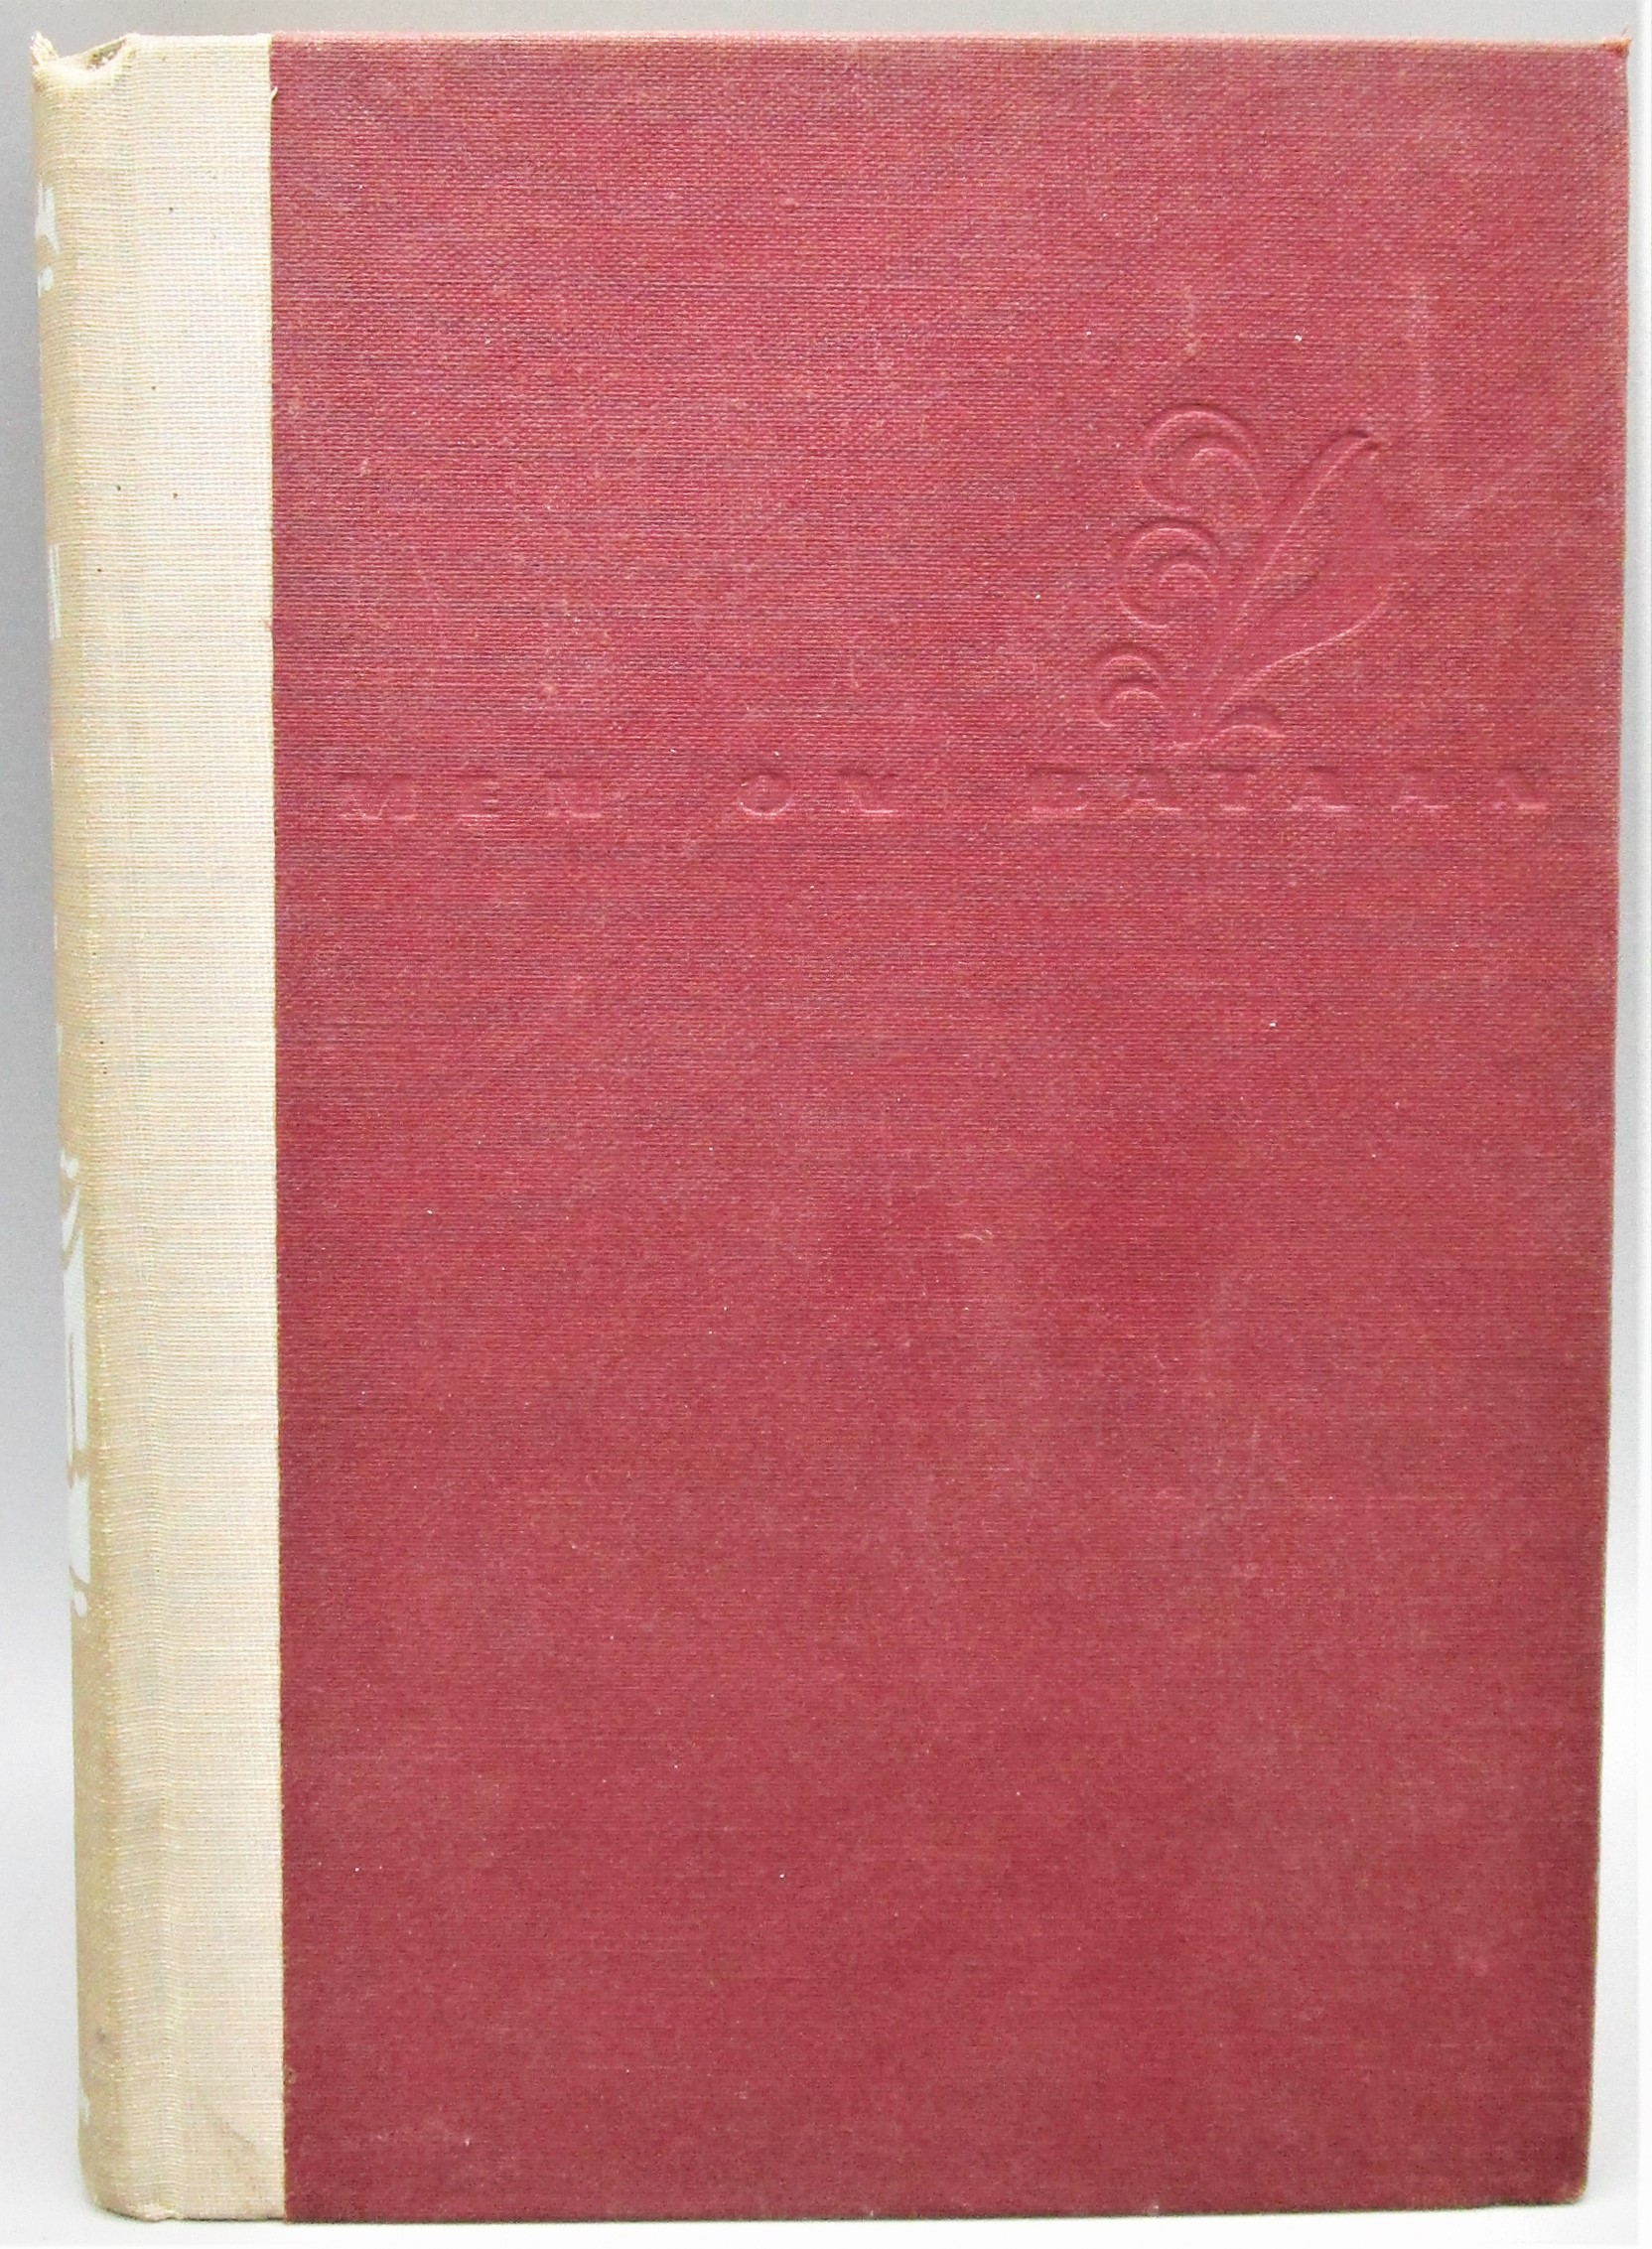 MEN ON BATAAN, by John Hersey - 1942 [1st Ed]